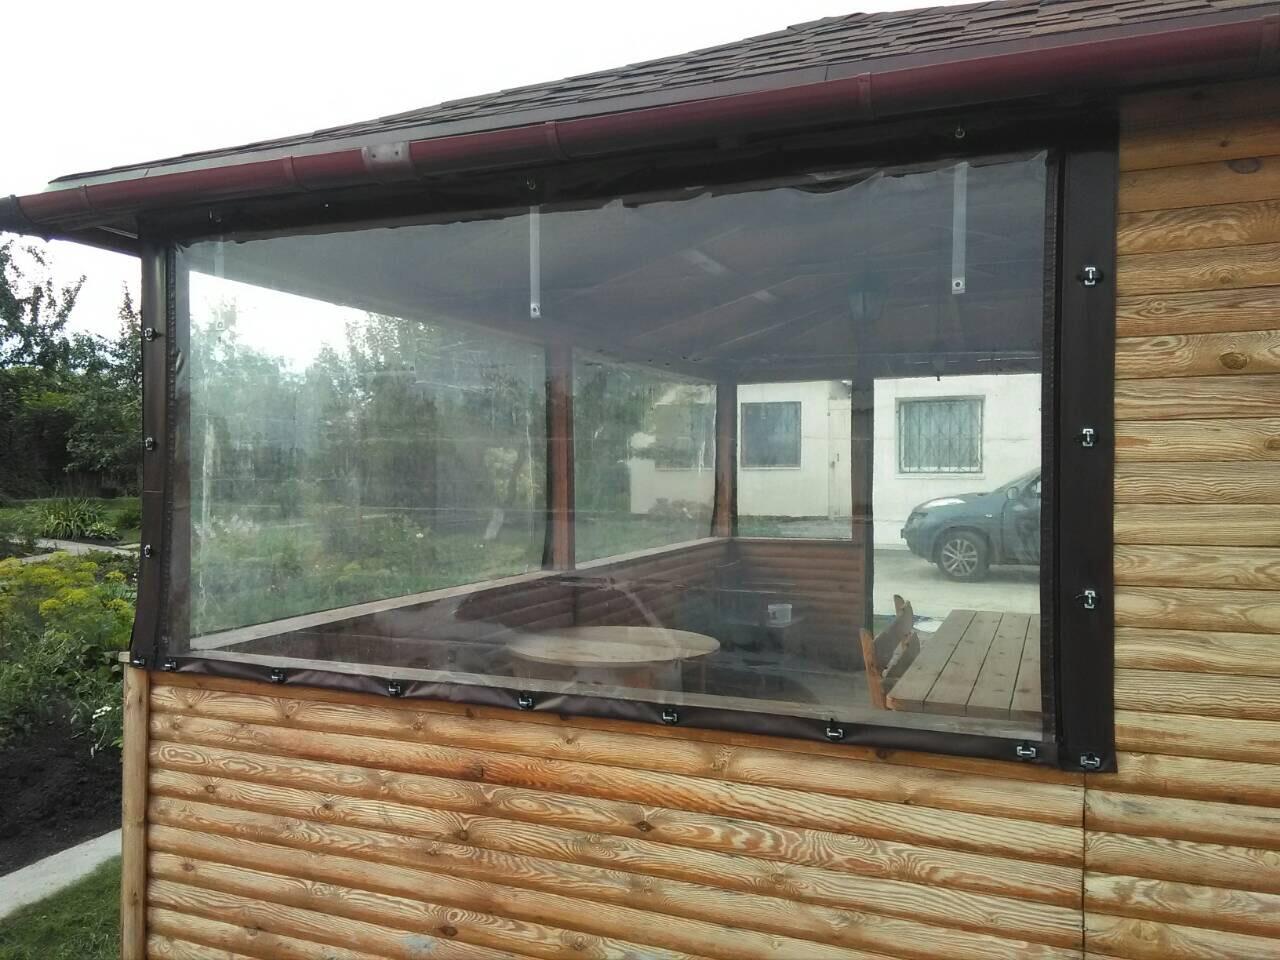 Мягкое окно в беседку на ремешках (2)